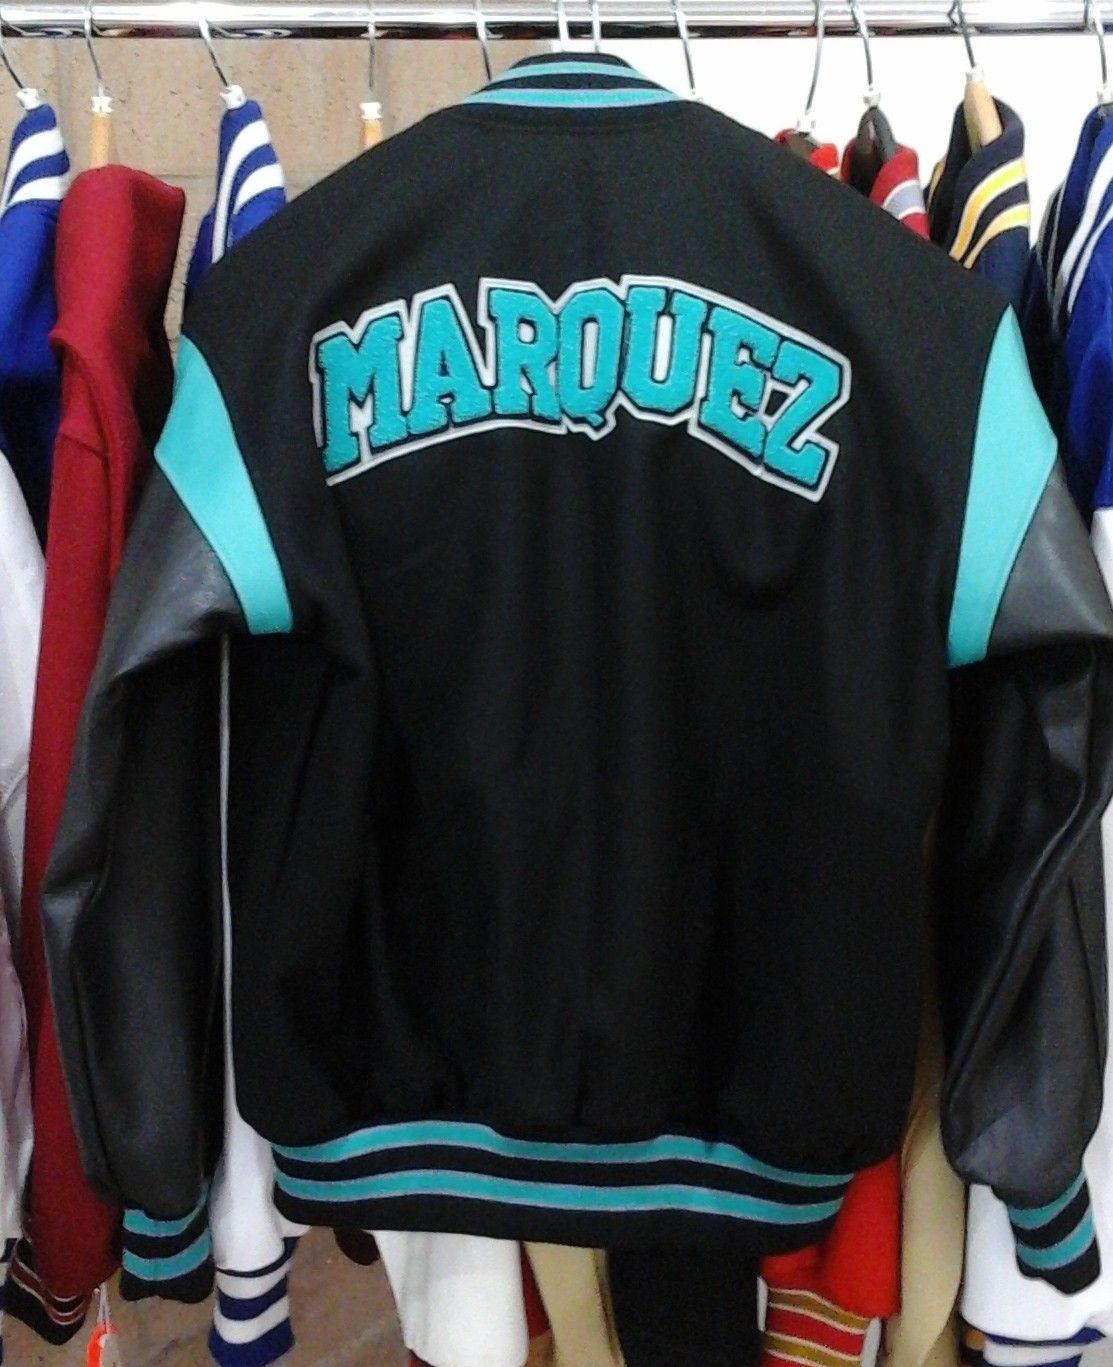 Varsity Jacket by Carrasco Sports Gear for Evergreen